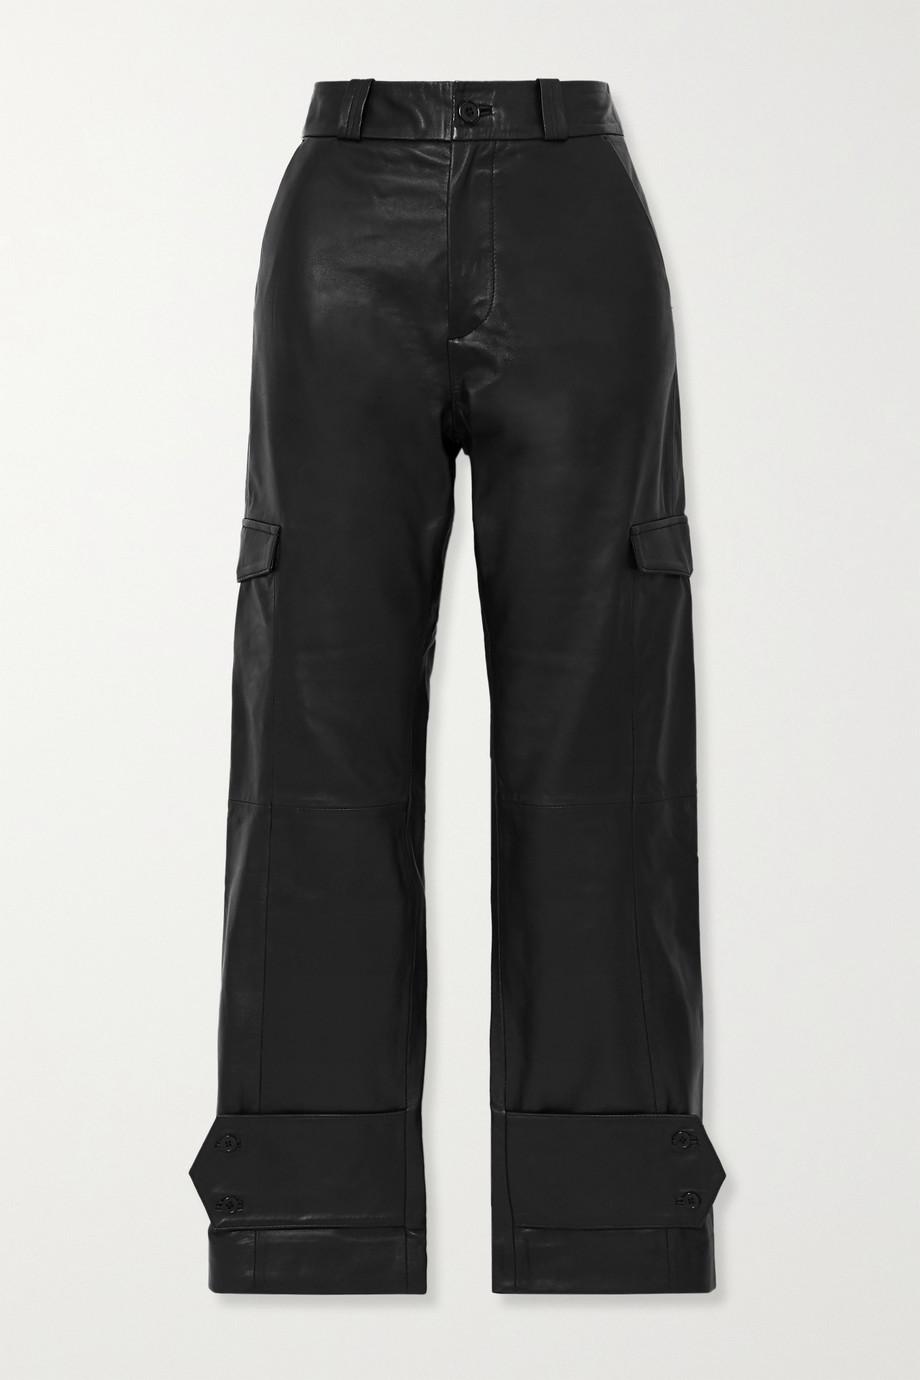 Holzweiler Dunder Hose mit geradem Bein aus Leder